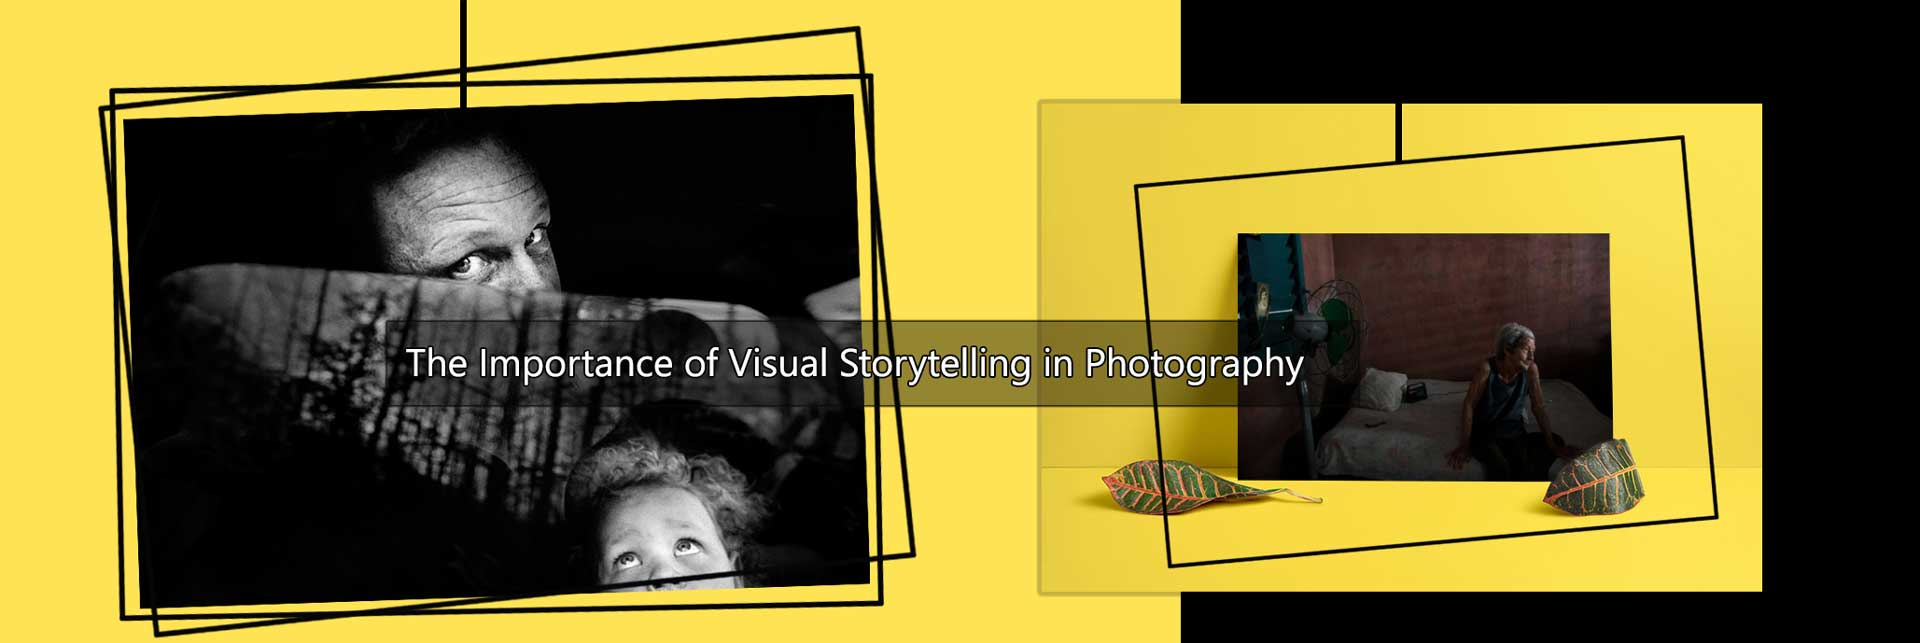 Visual Storytelling in  Photography1 - روایت داستان با عکس